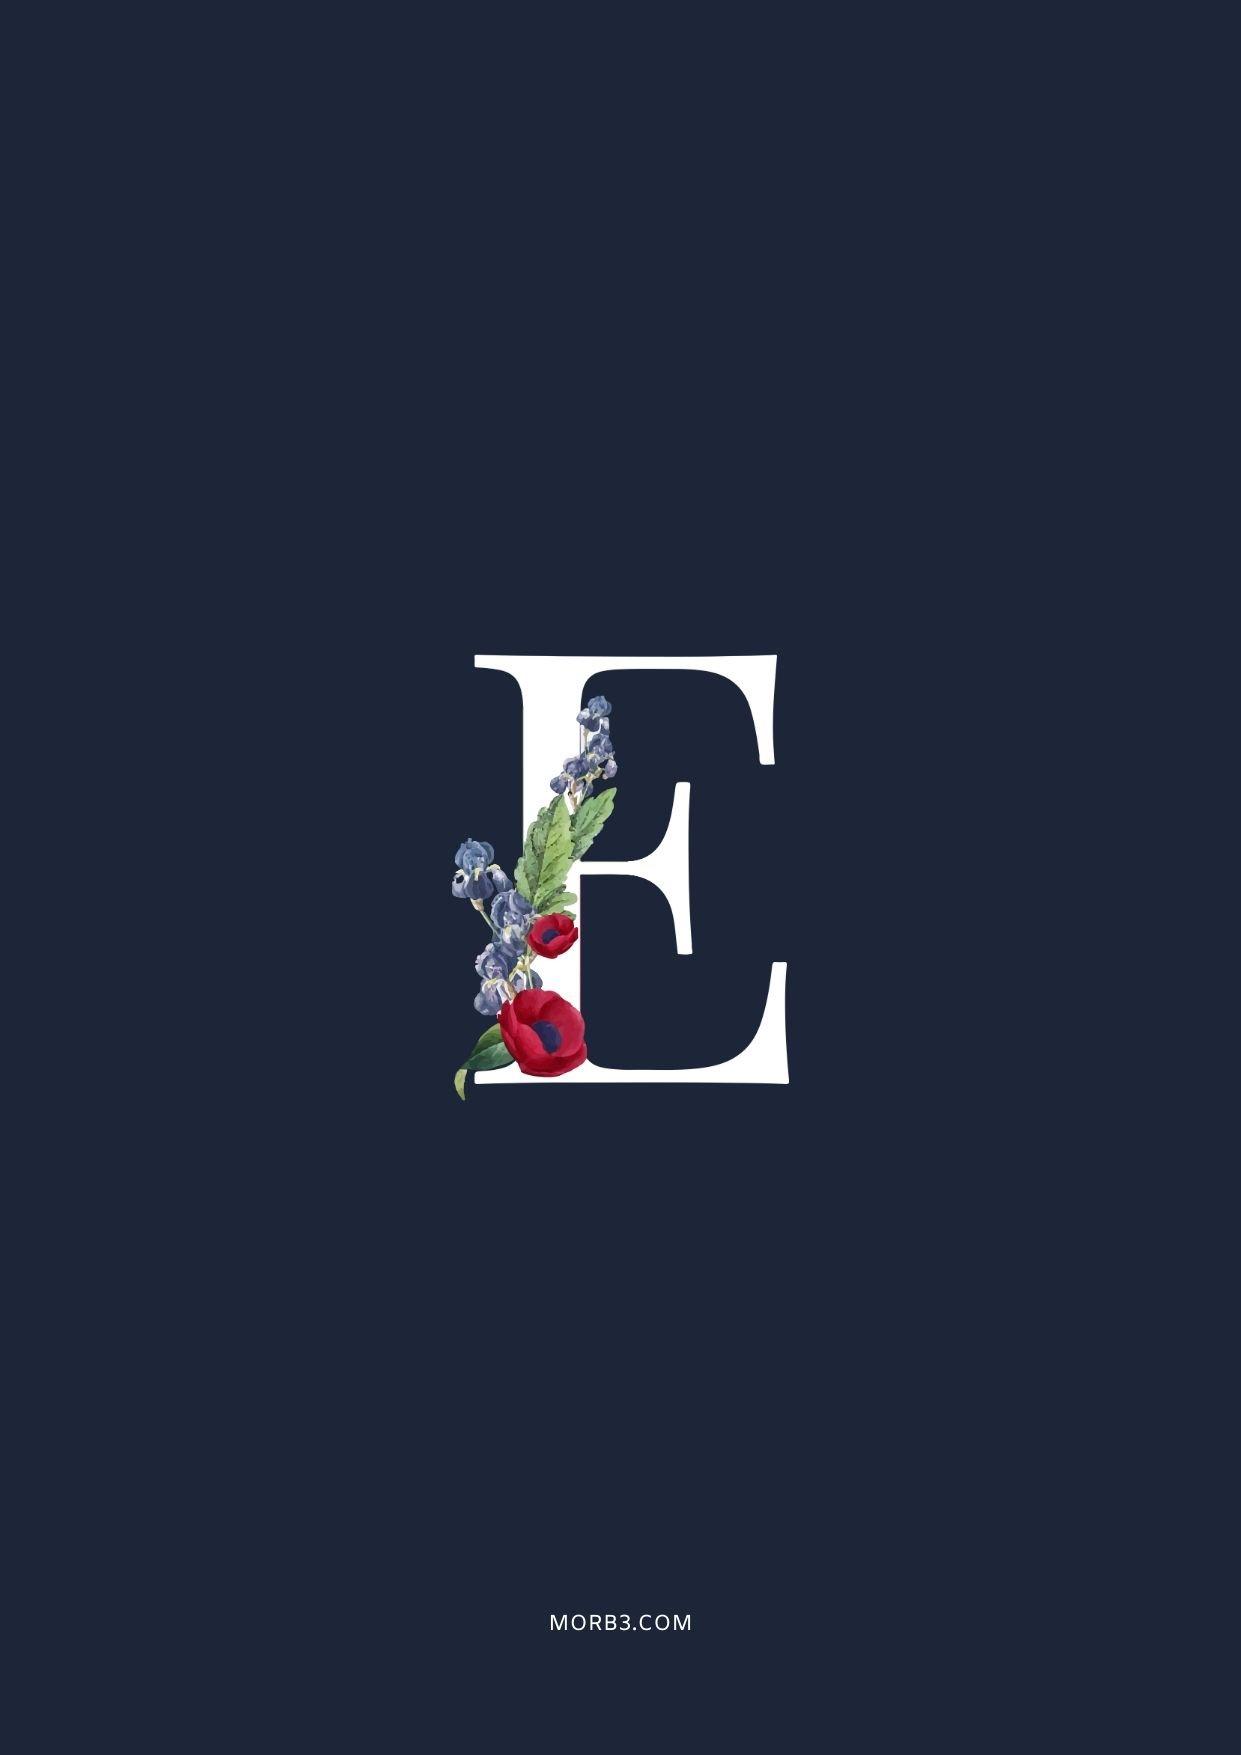 مزخرفة حرف E رومنسي